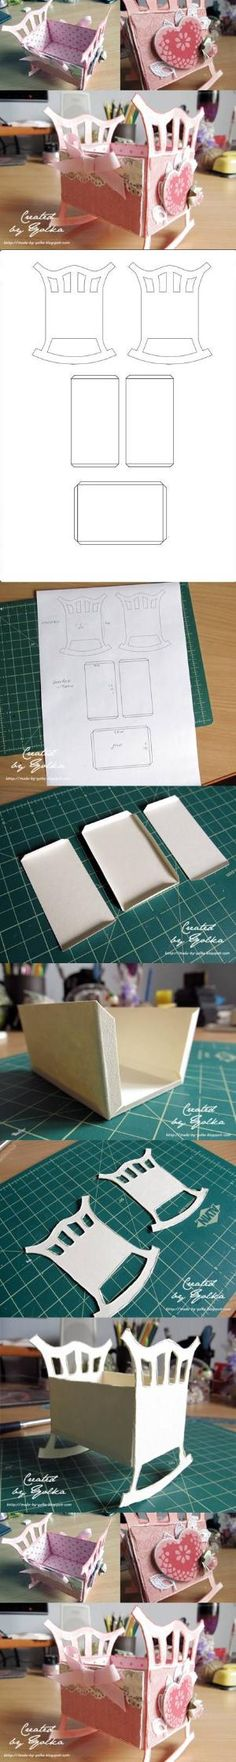 DIY Origami Crib diy craft crafts how to tutorial paper crafts origami baby crafts Paper Crafts Origami, Diy Origami, Diy Paper, Paper Art, Kirigami, Baby Crafts, Kids Crafts, Papier Diy, Diy Crib